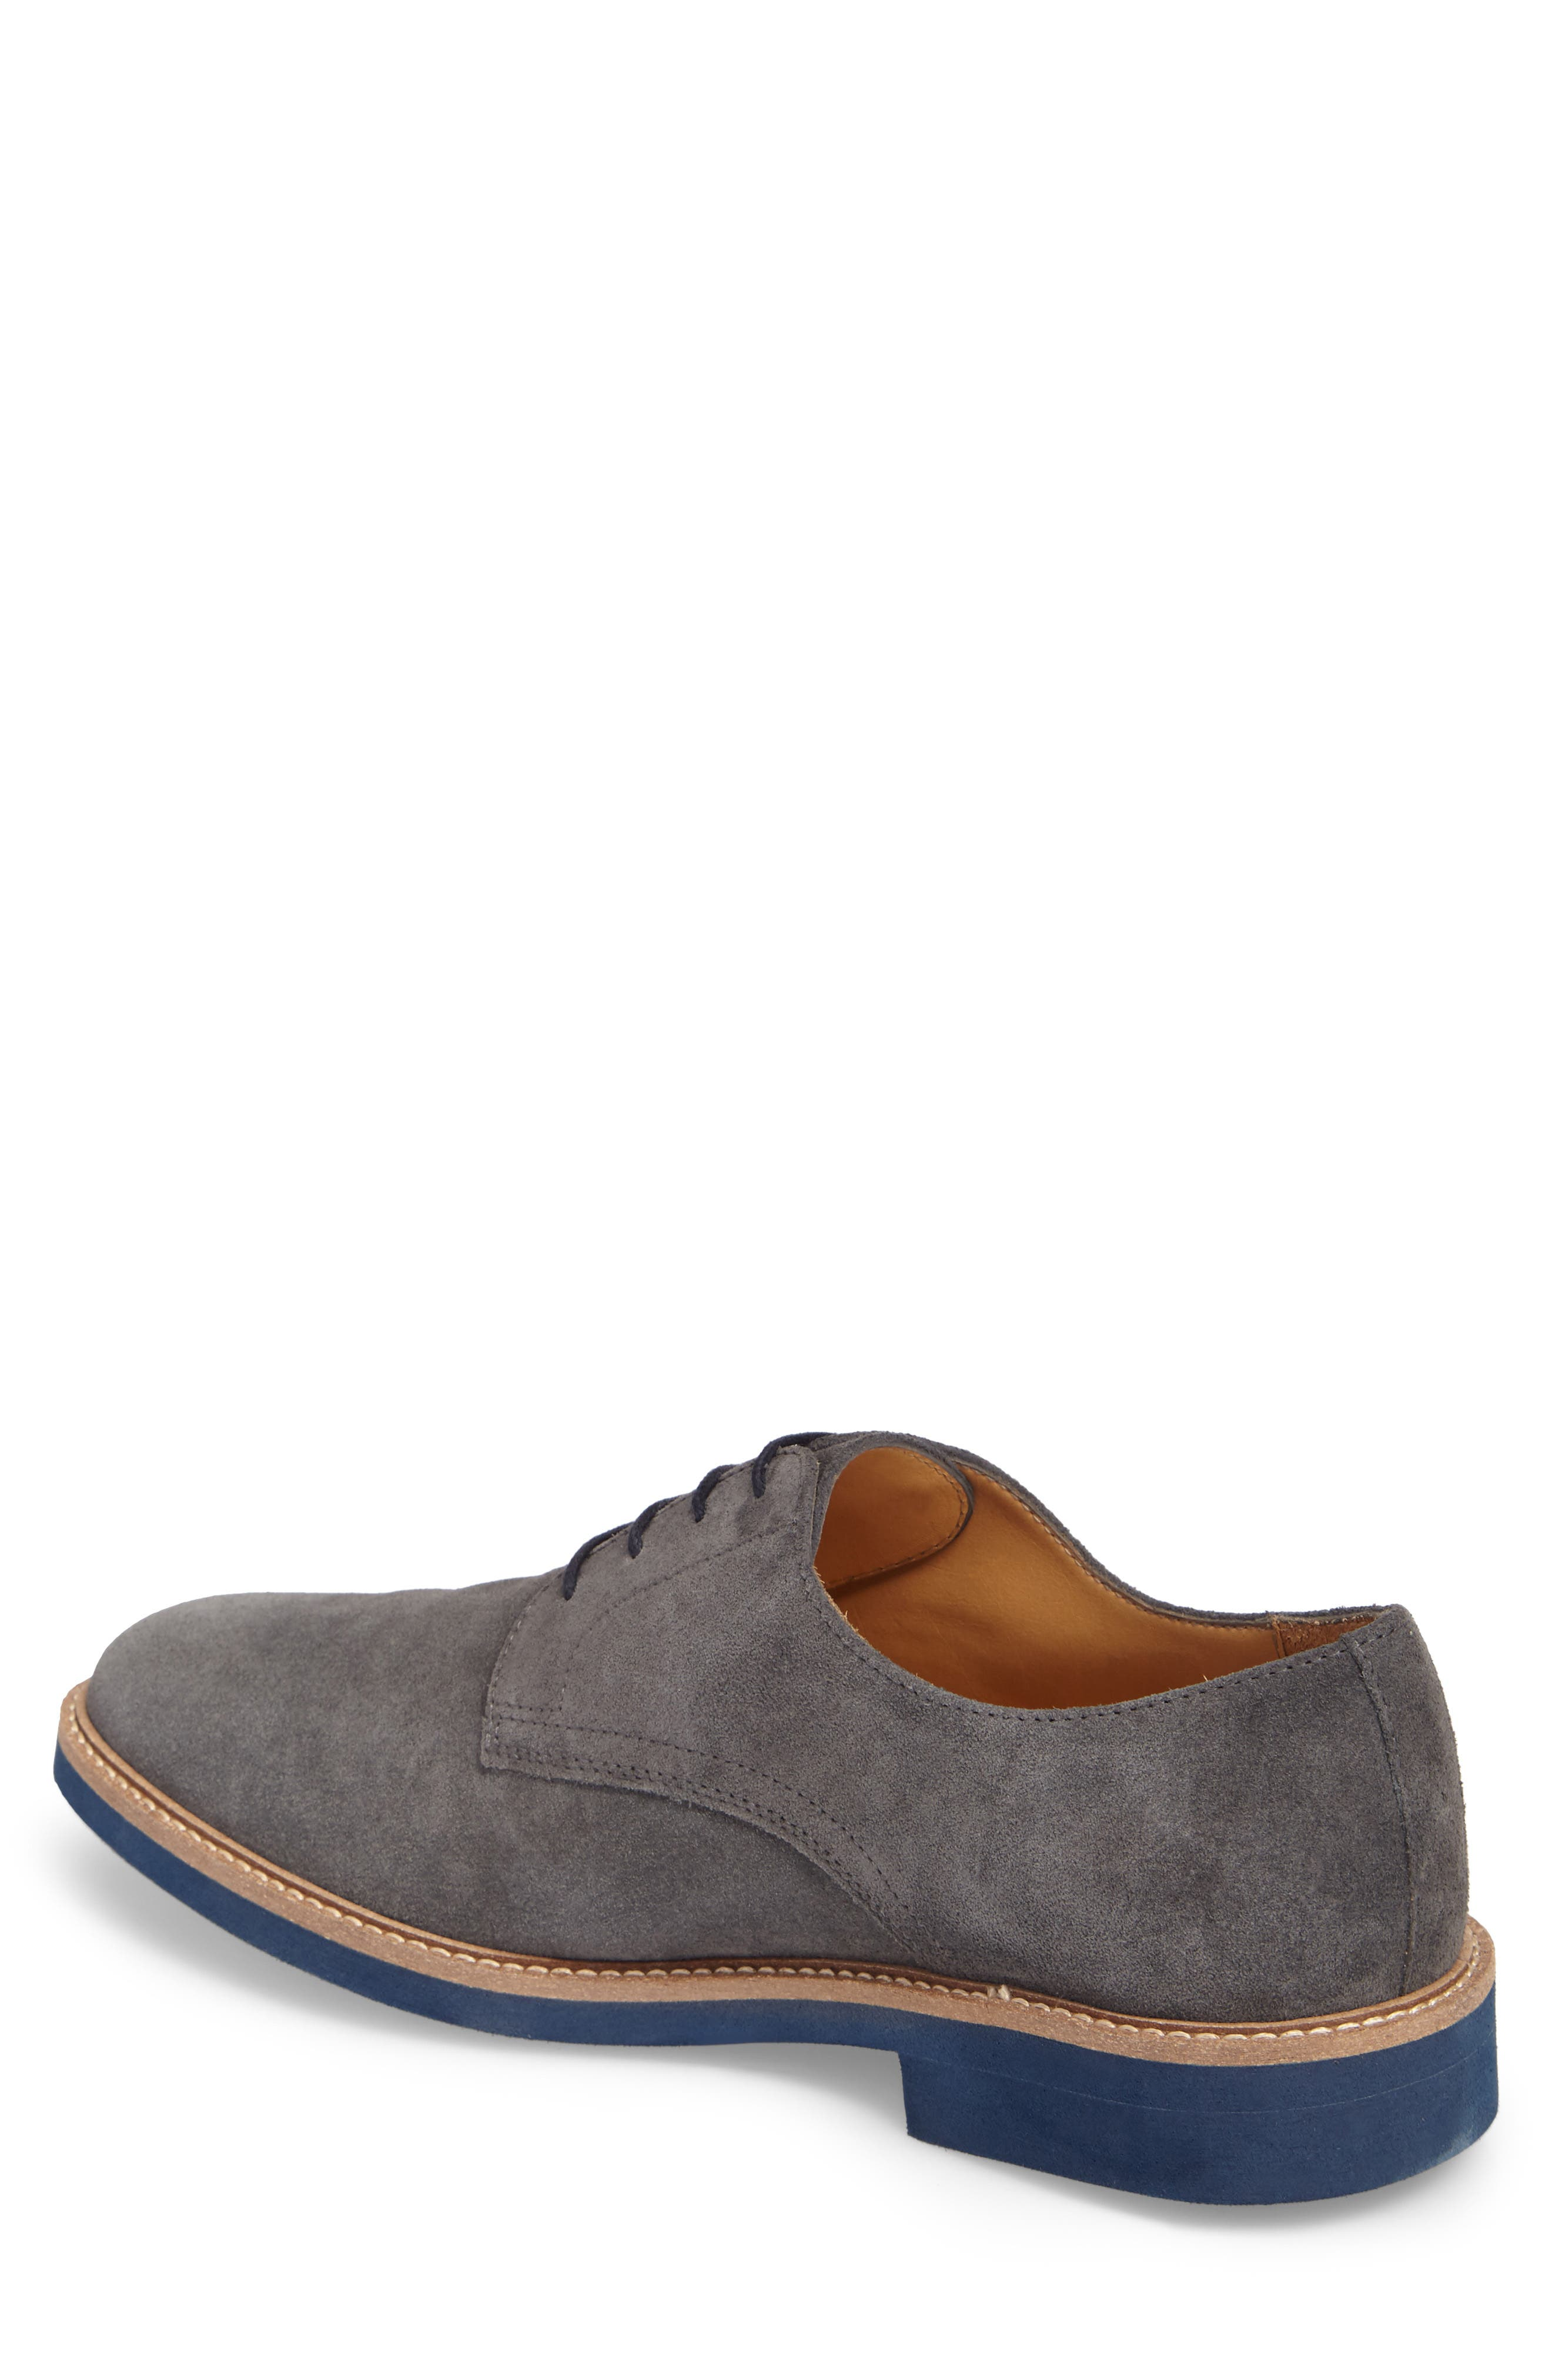 Buck Shoe,                             Alternate thumbnail 2, color,                             Grey Suede